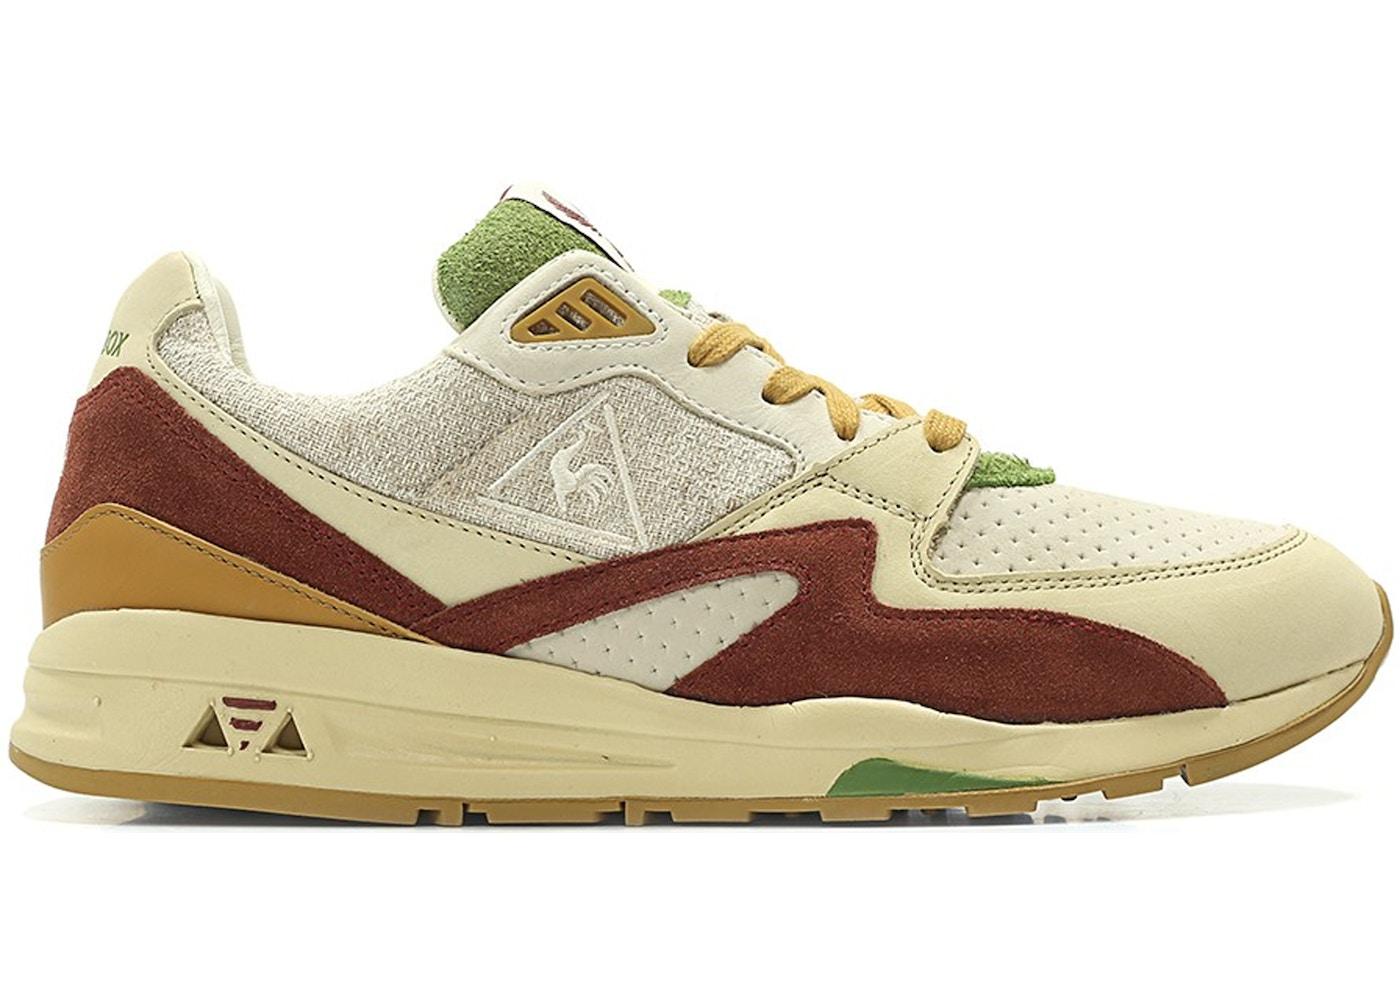 af5943b3fe85 Le Coq Sportif LCS R800 Sneakerbox Hummus - 1810875